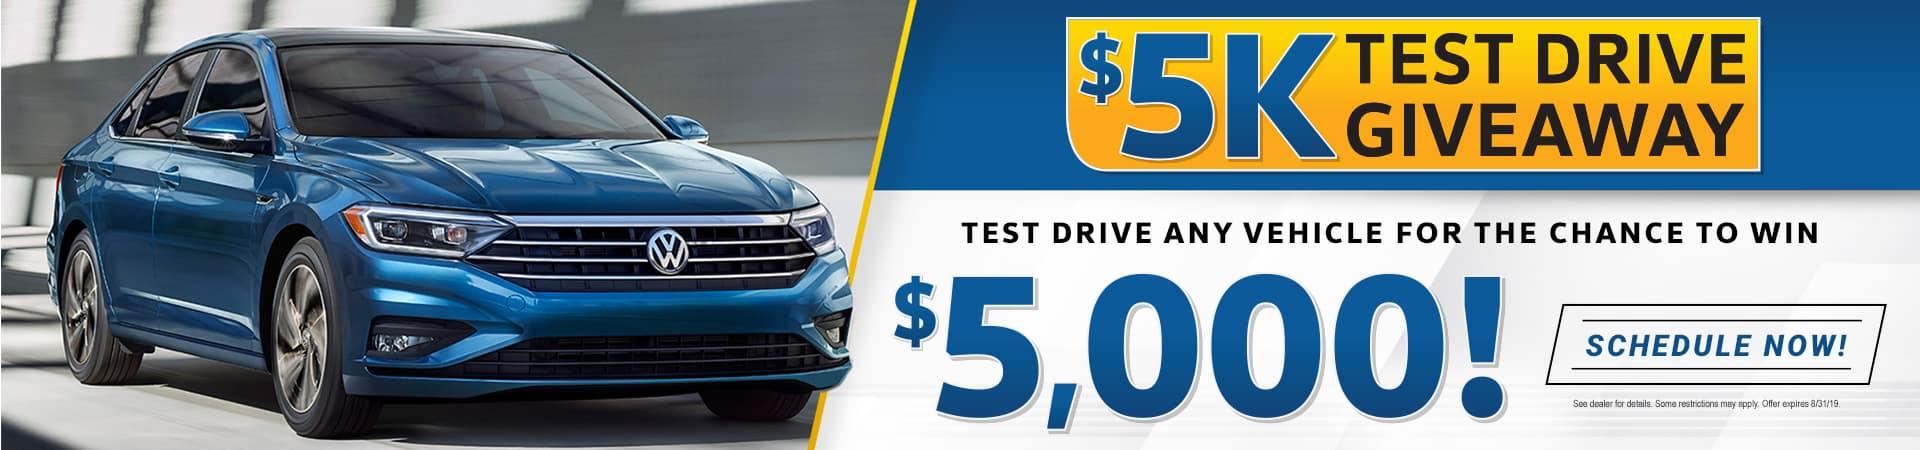 5000 test drive getaway